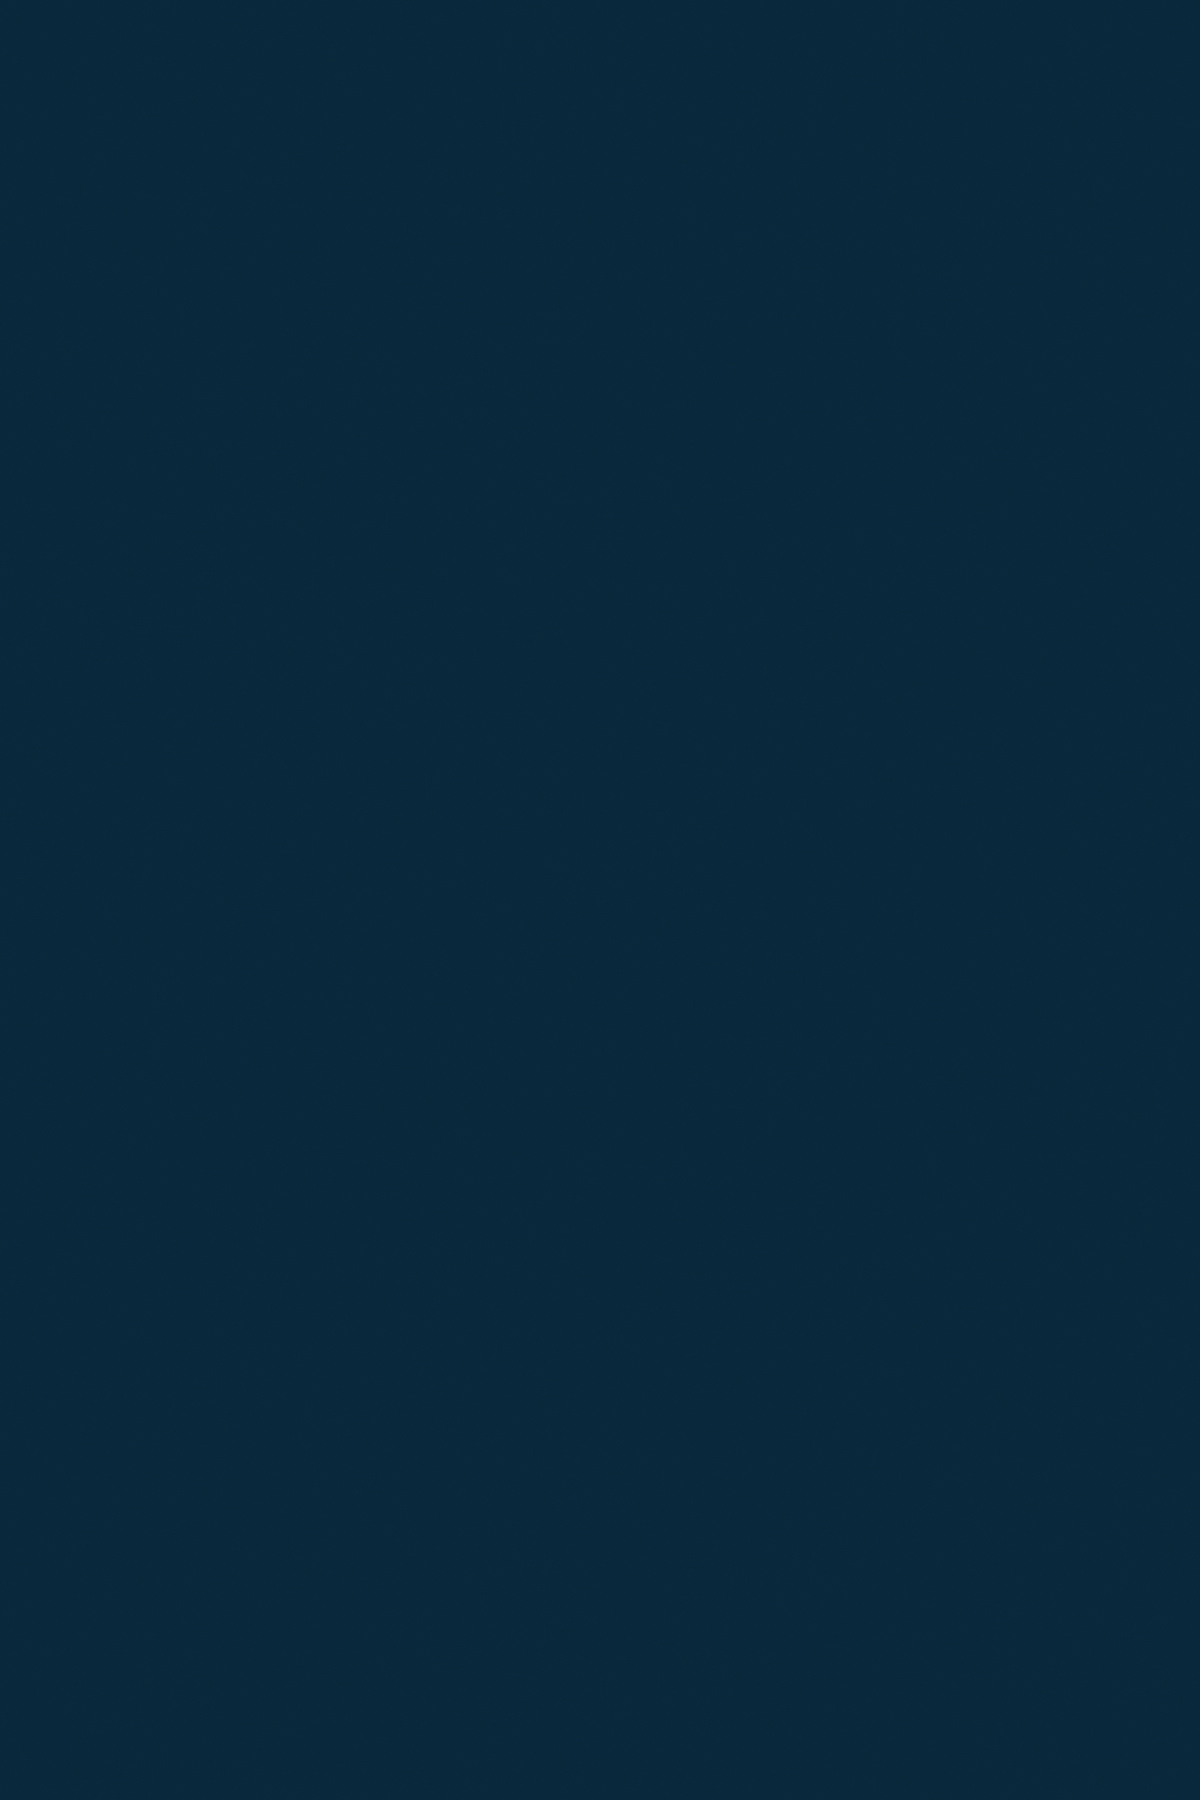 8984BS Морской Синий